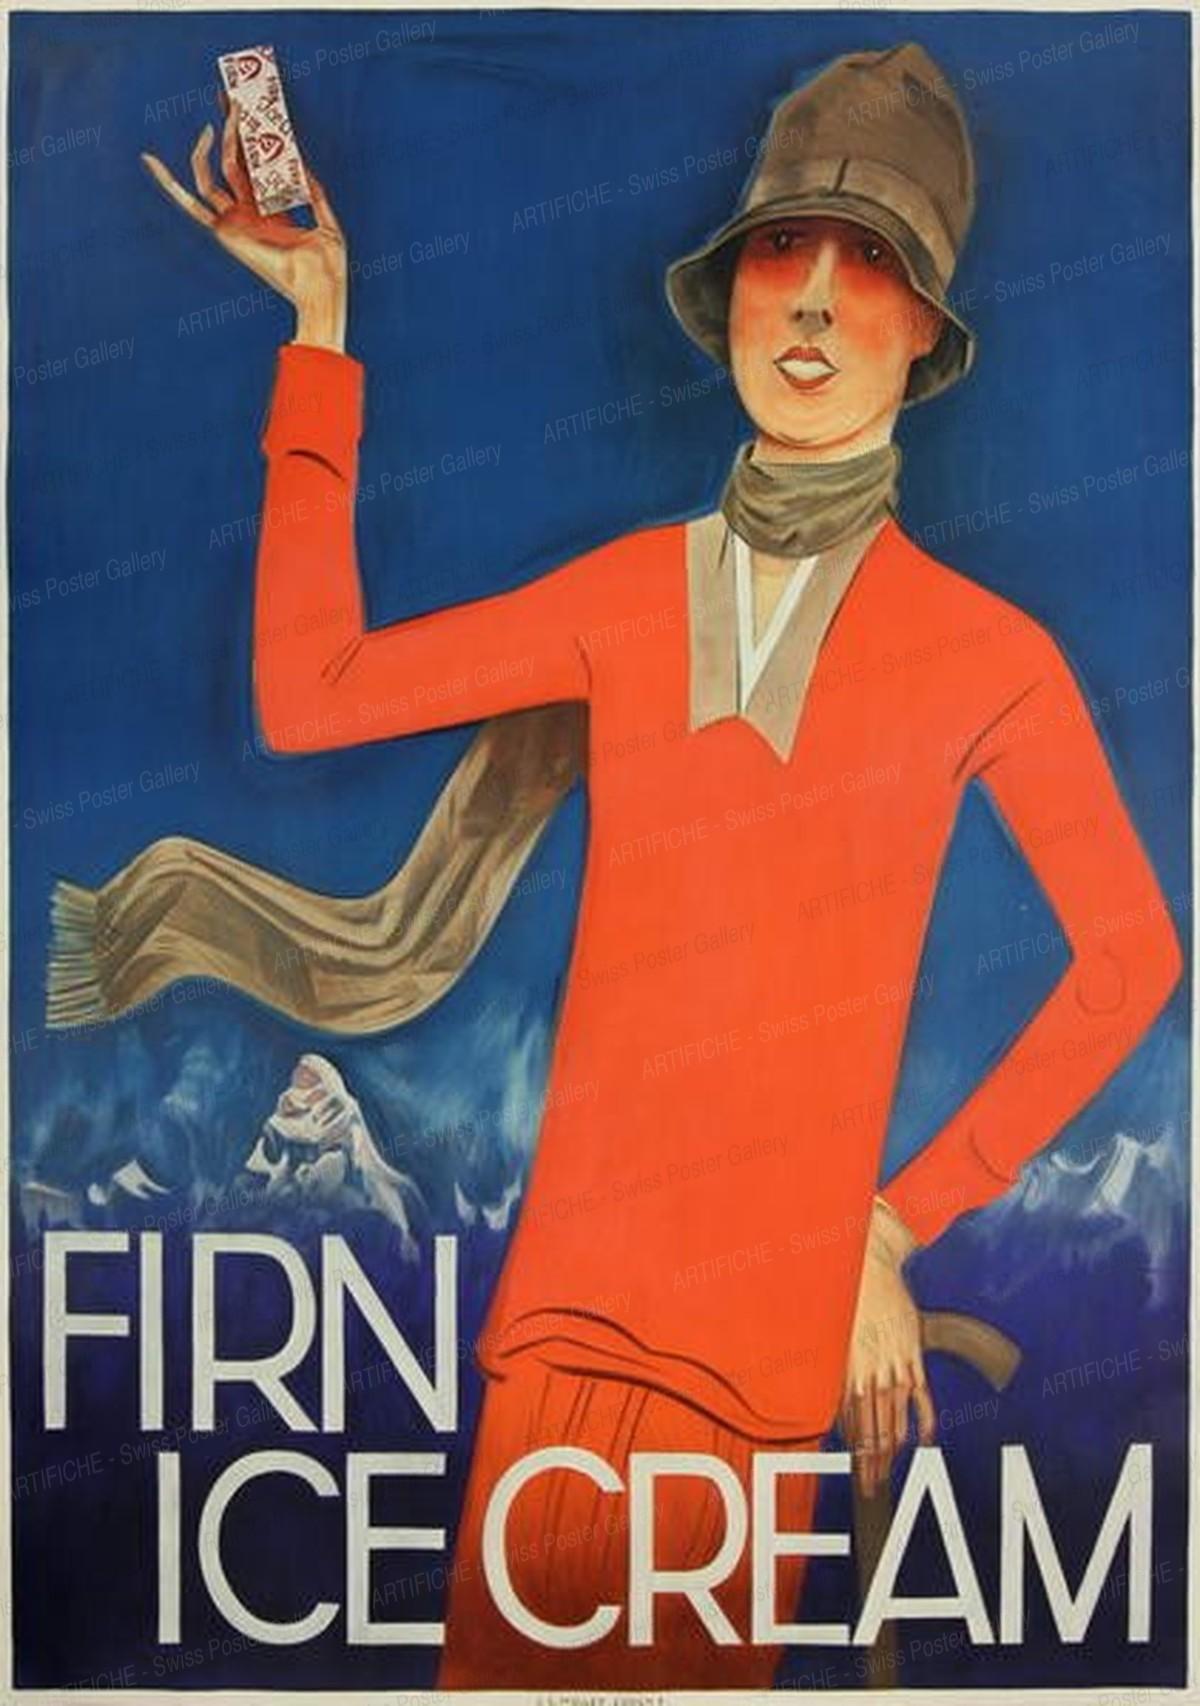 Firn Ice Cream, Otto Baumberger